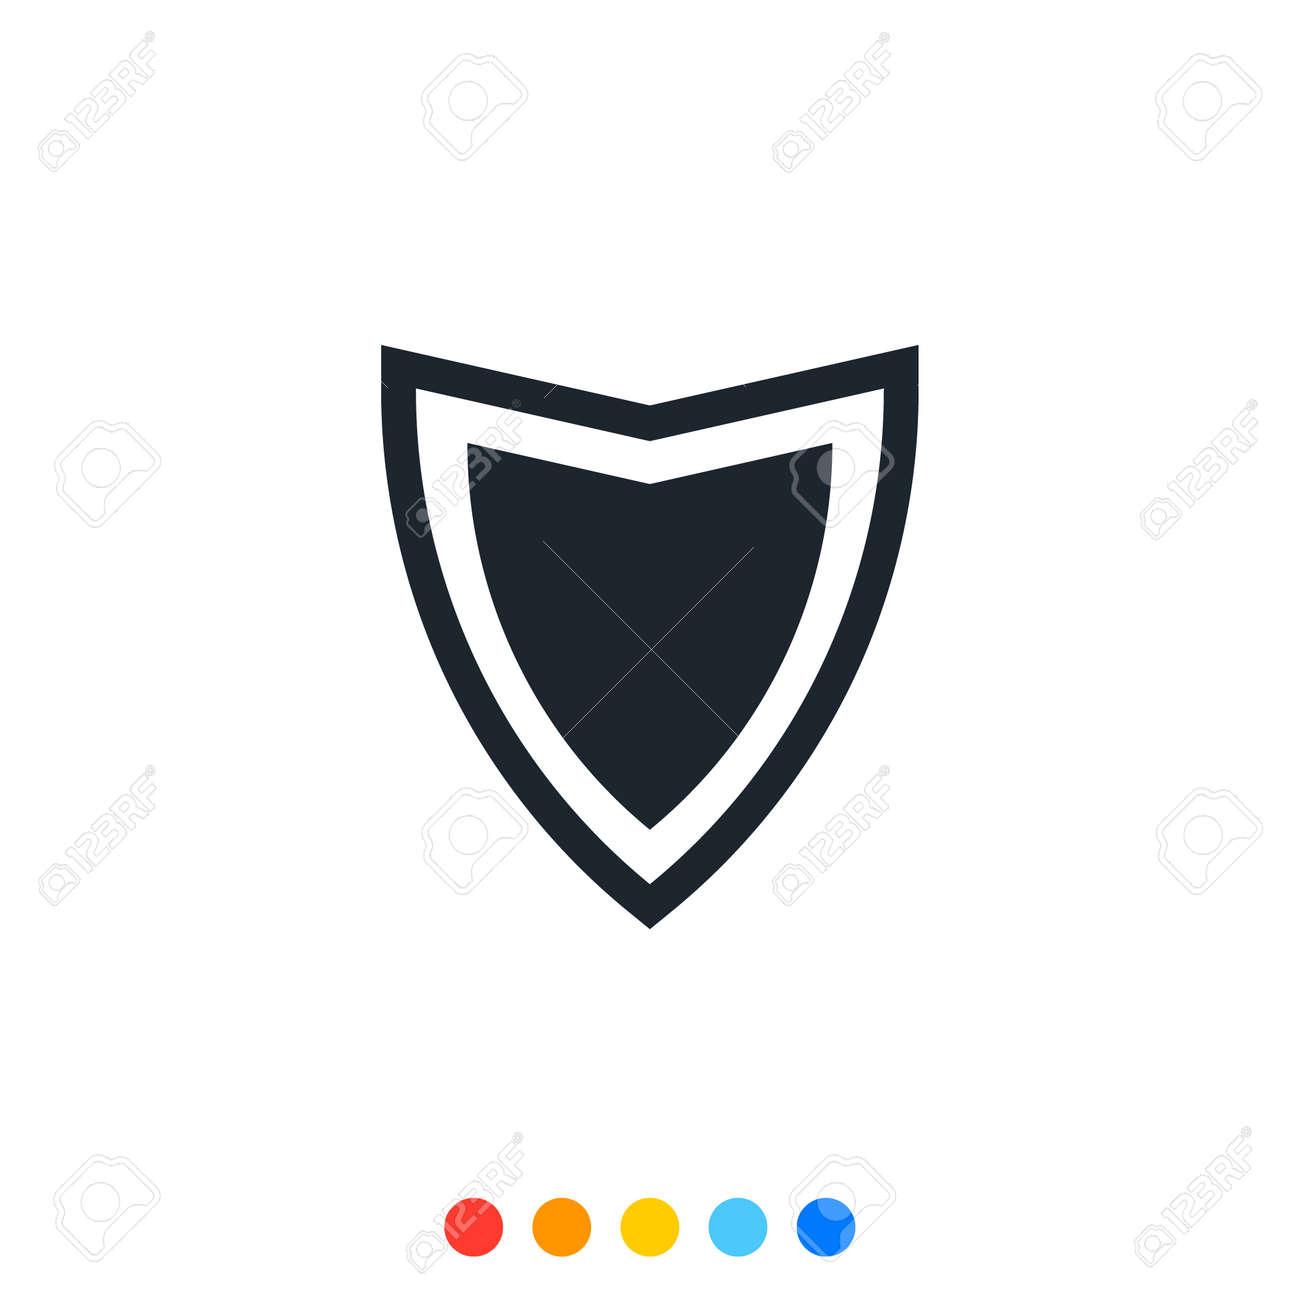 Protection shield icon,Interception icon,Antivirus icon. - 153946271